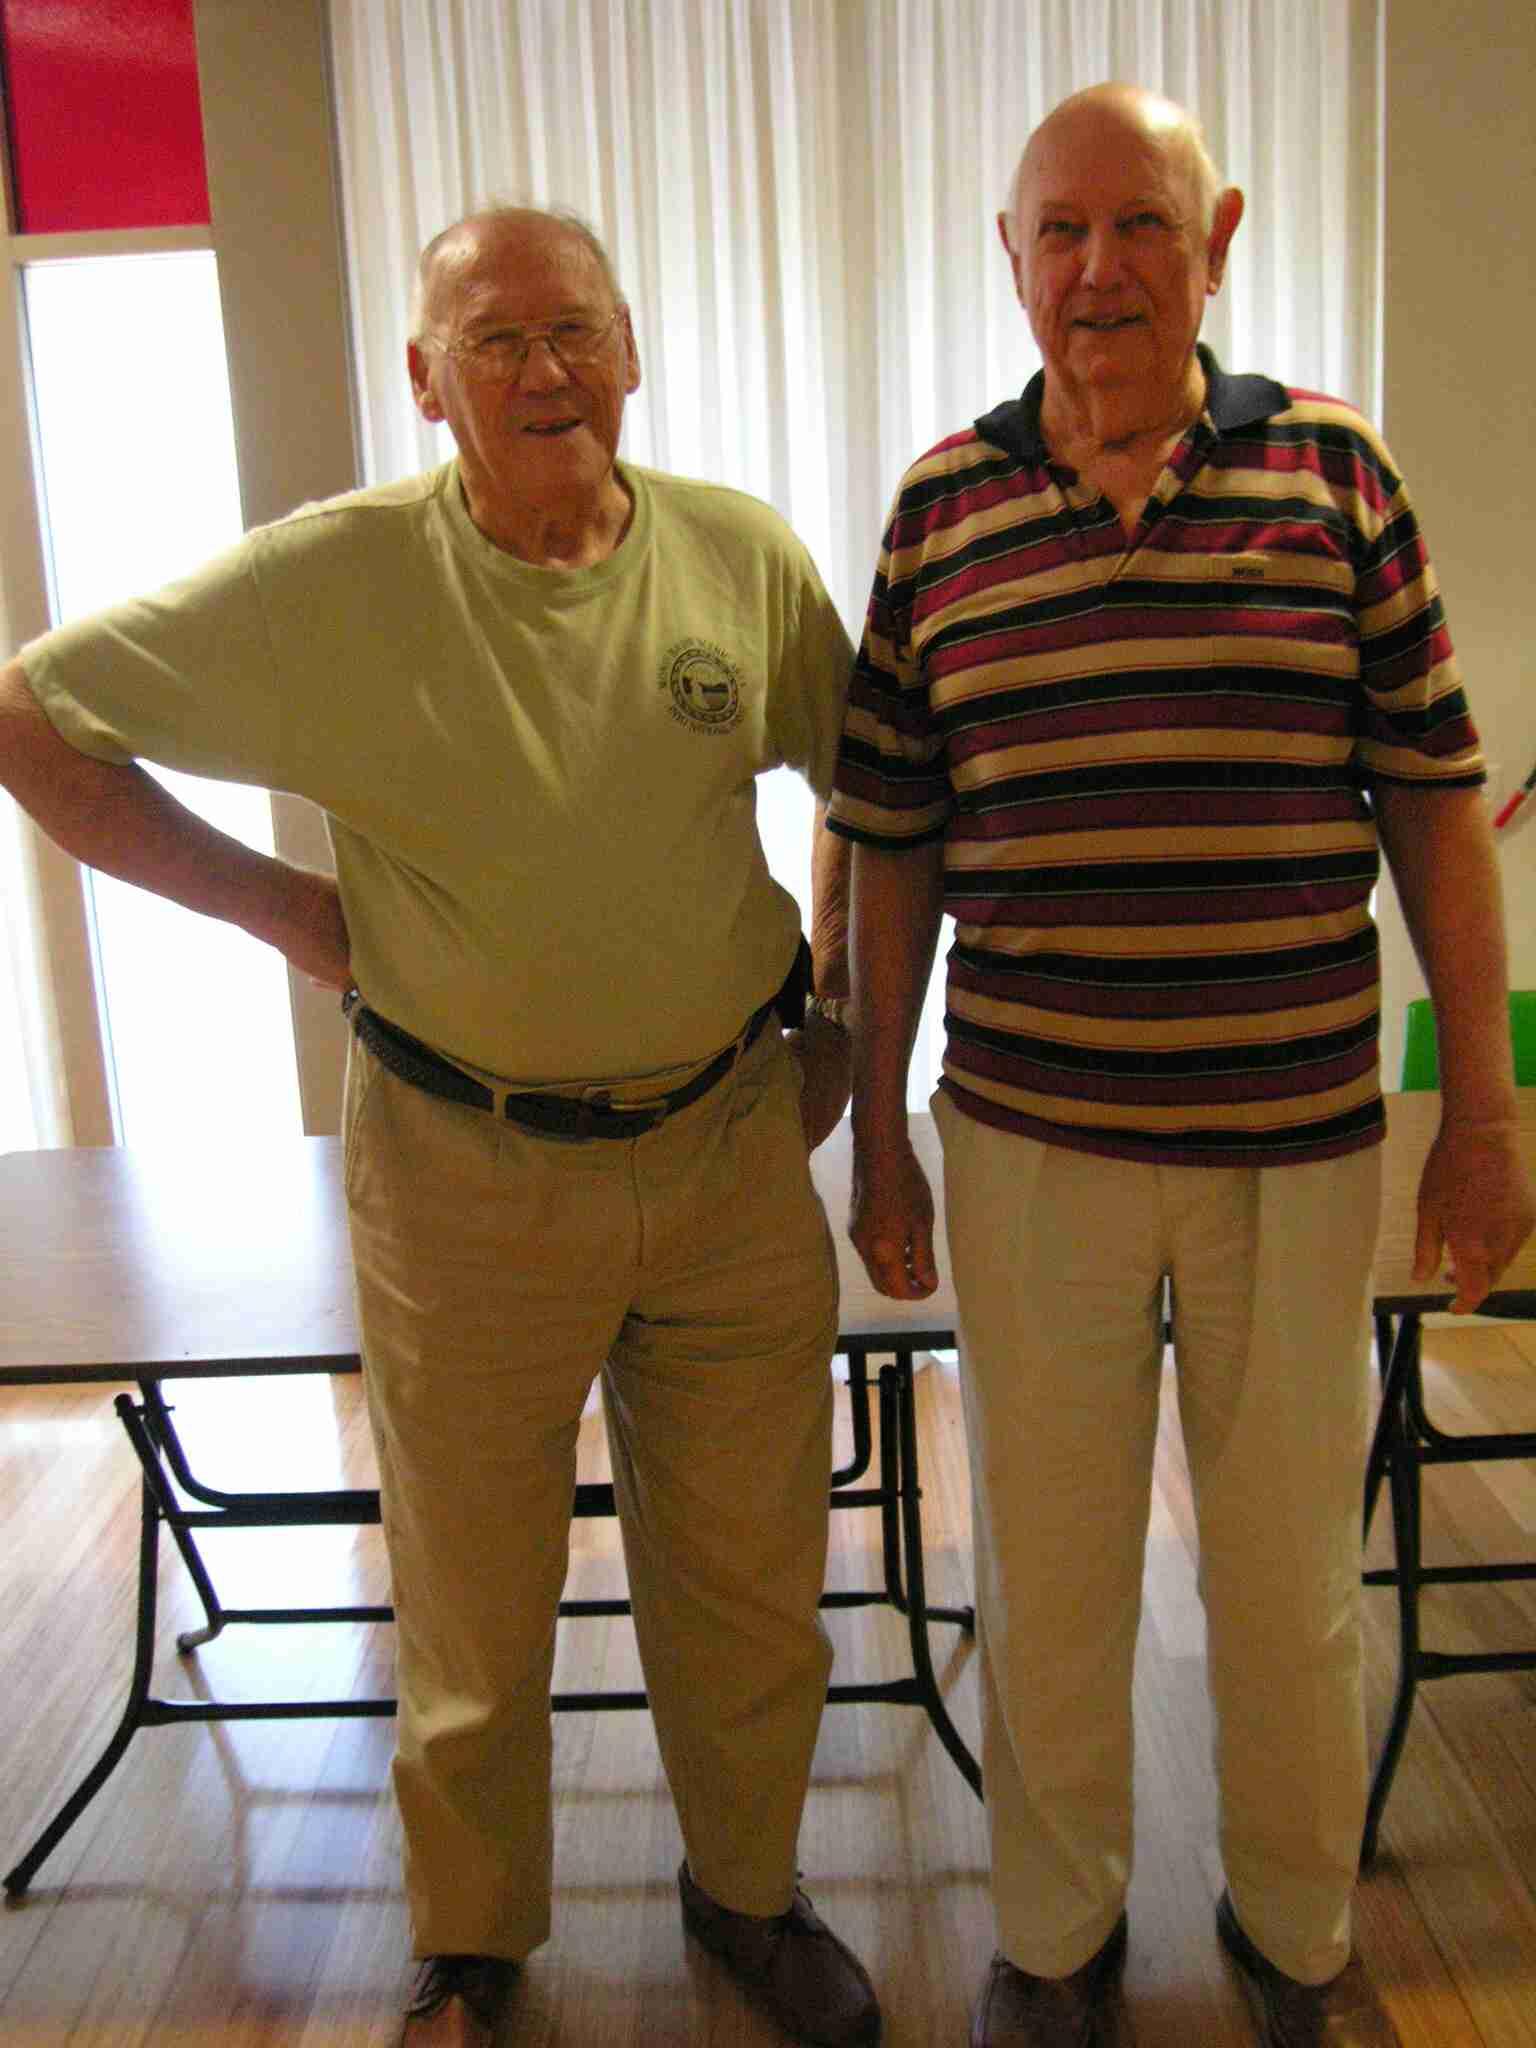 Michael O'Dea & Peter Henderson (12 May 2012)